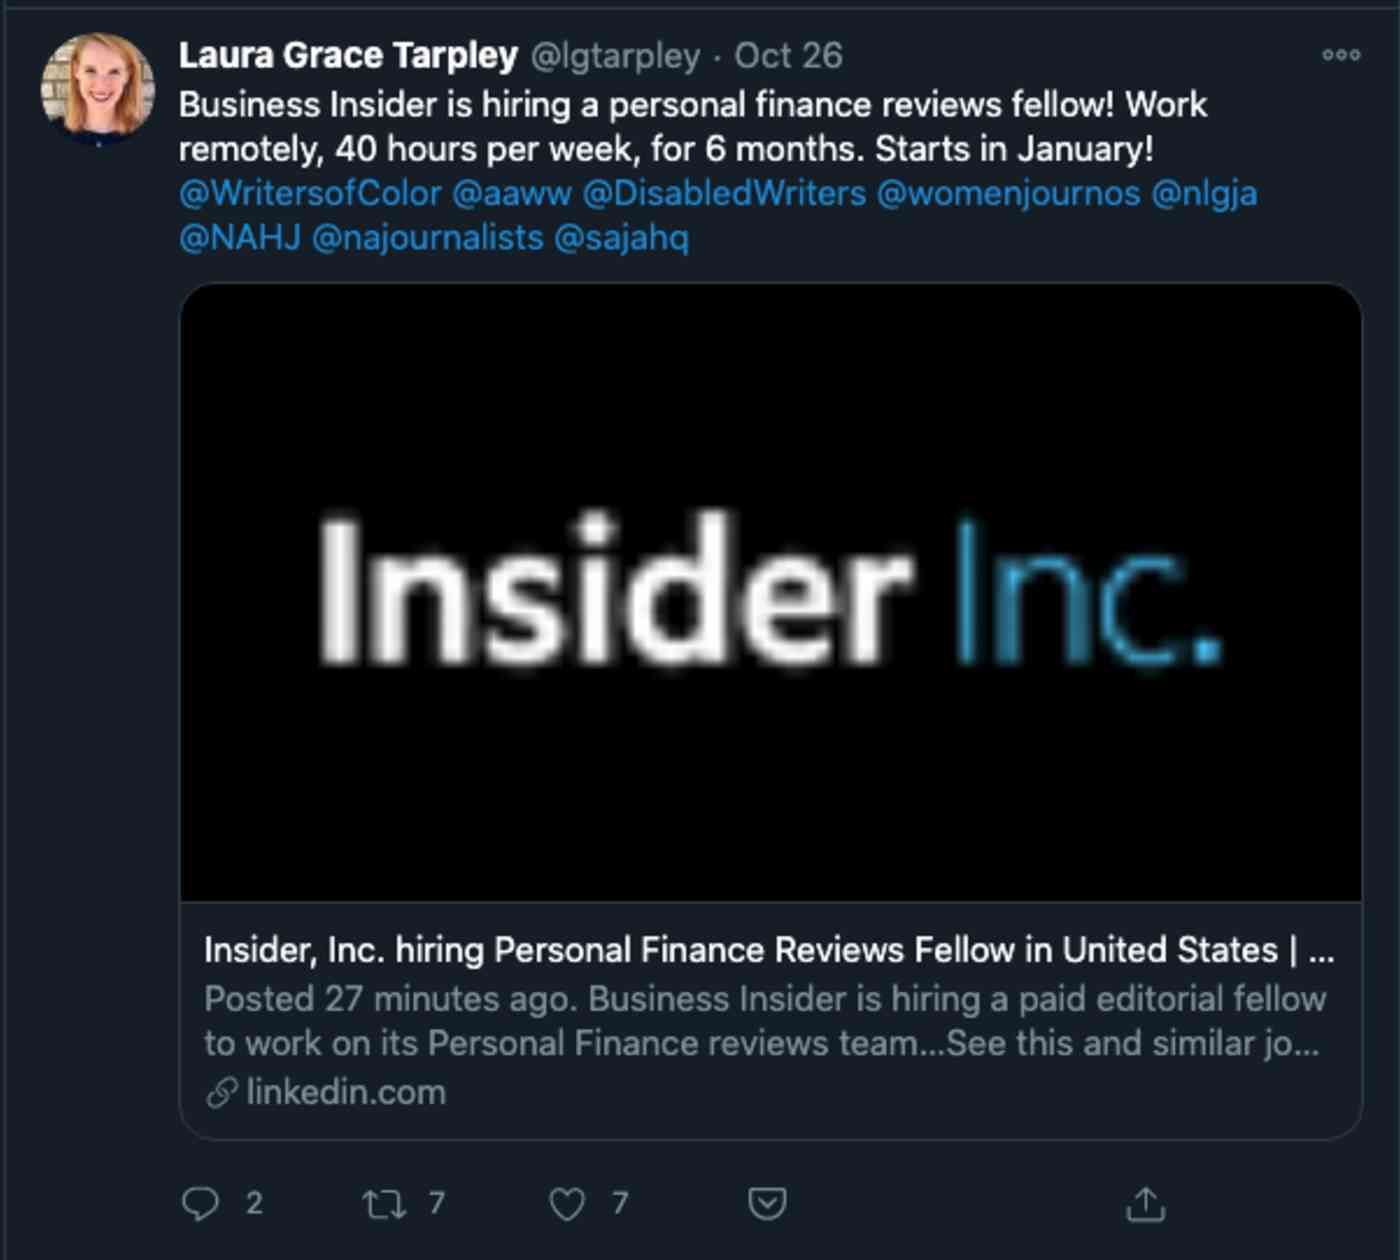 A screenshot of the original tweet in the Twitter app.